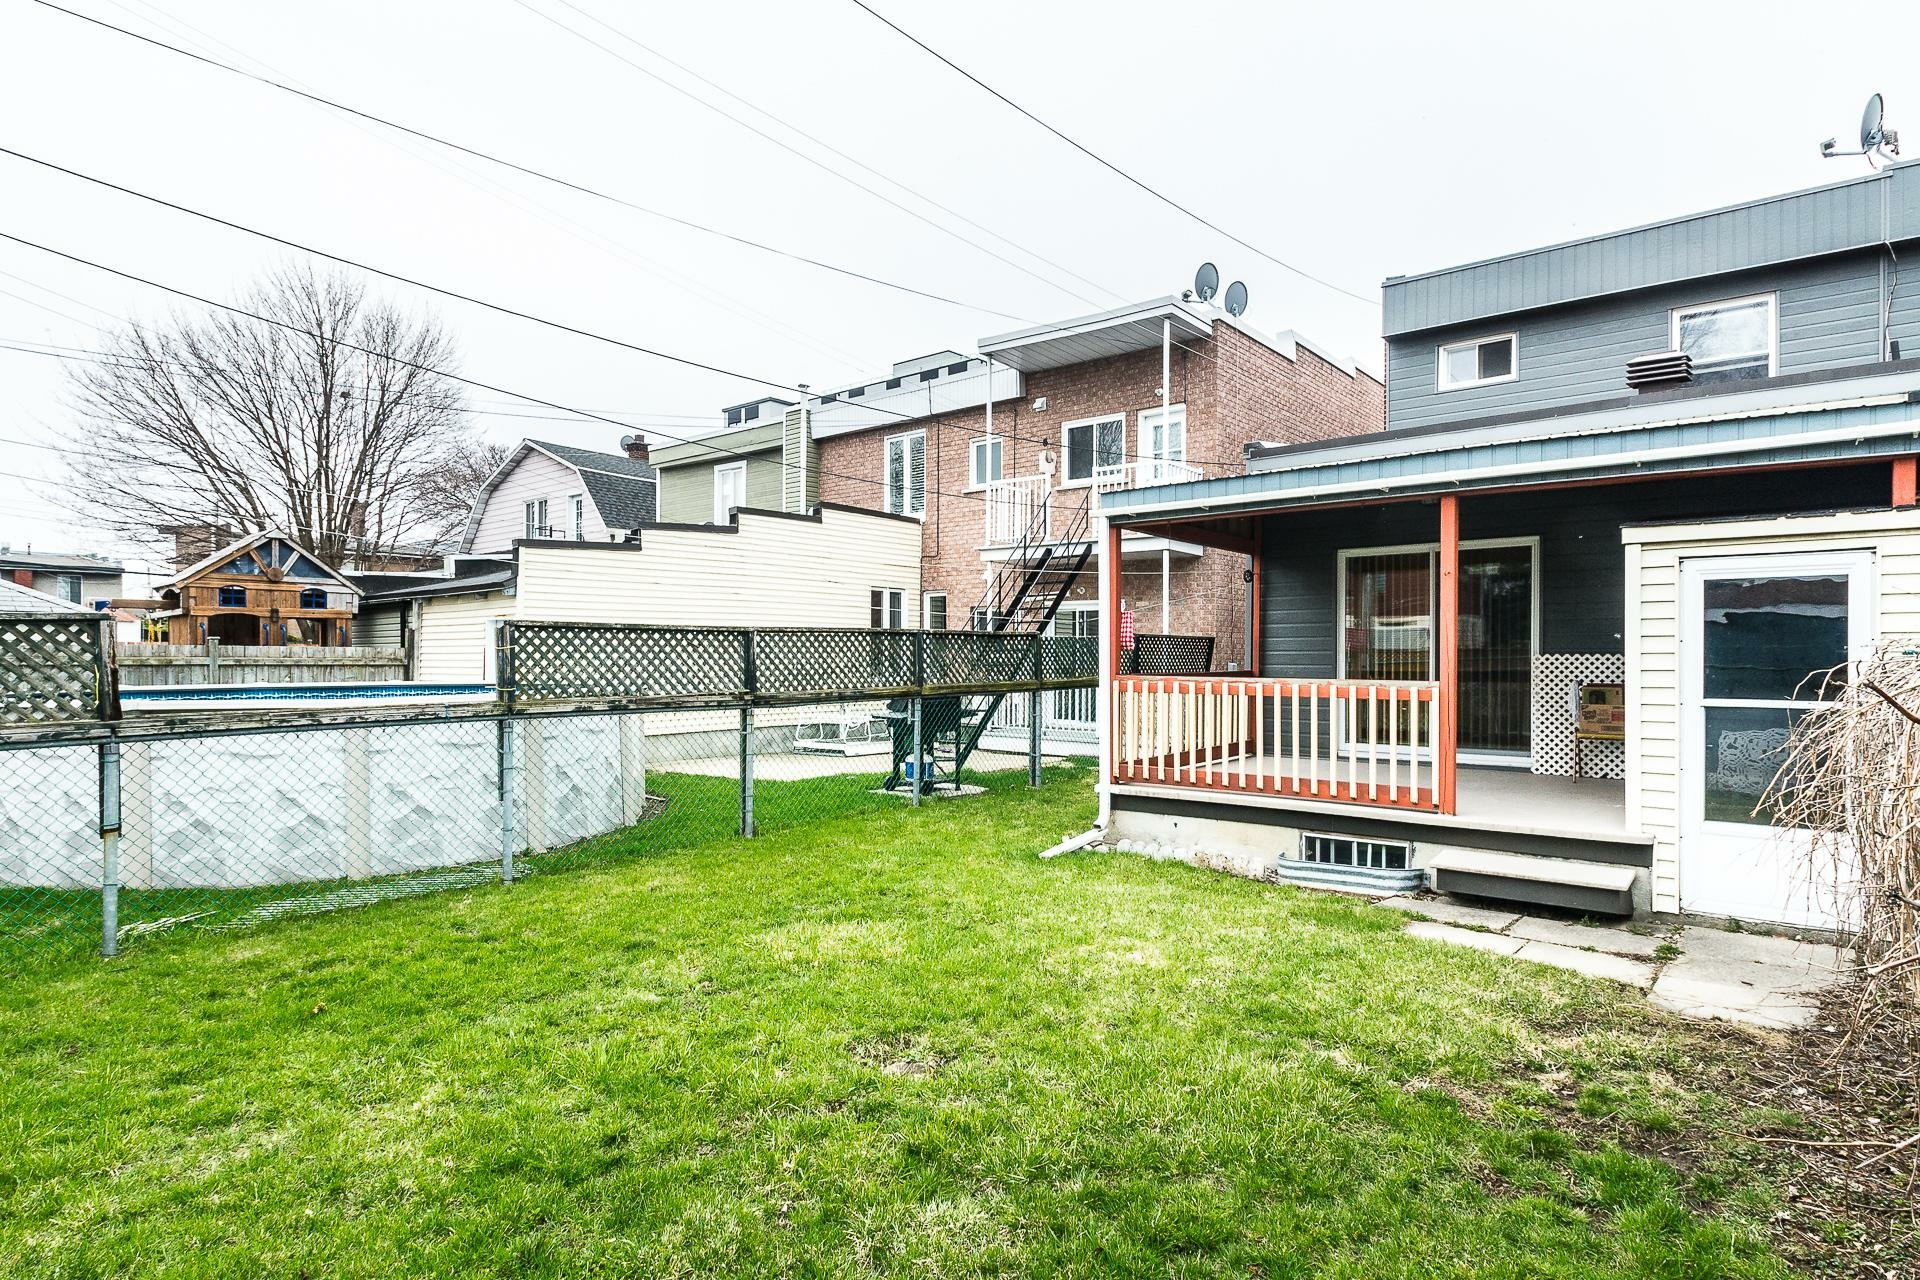 image 1 - Duplex En venta Montréal Lachine  - 3 habitaciones